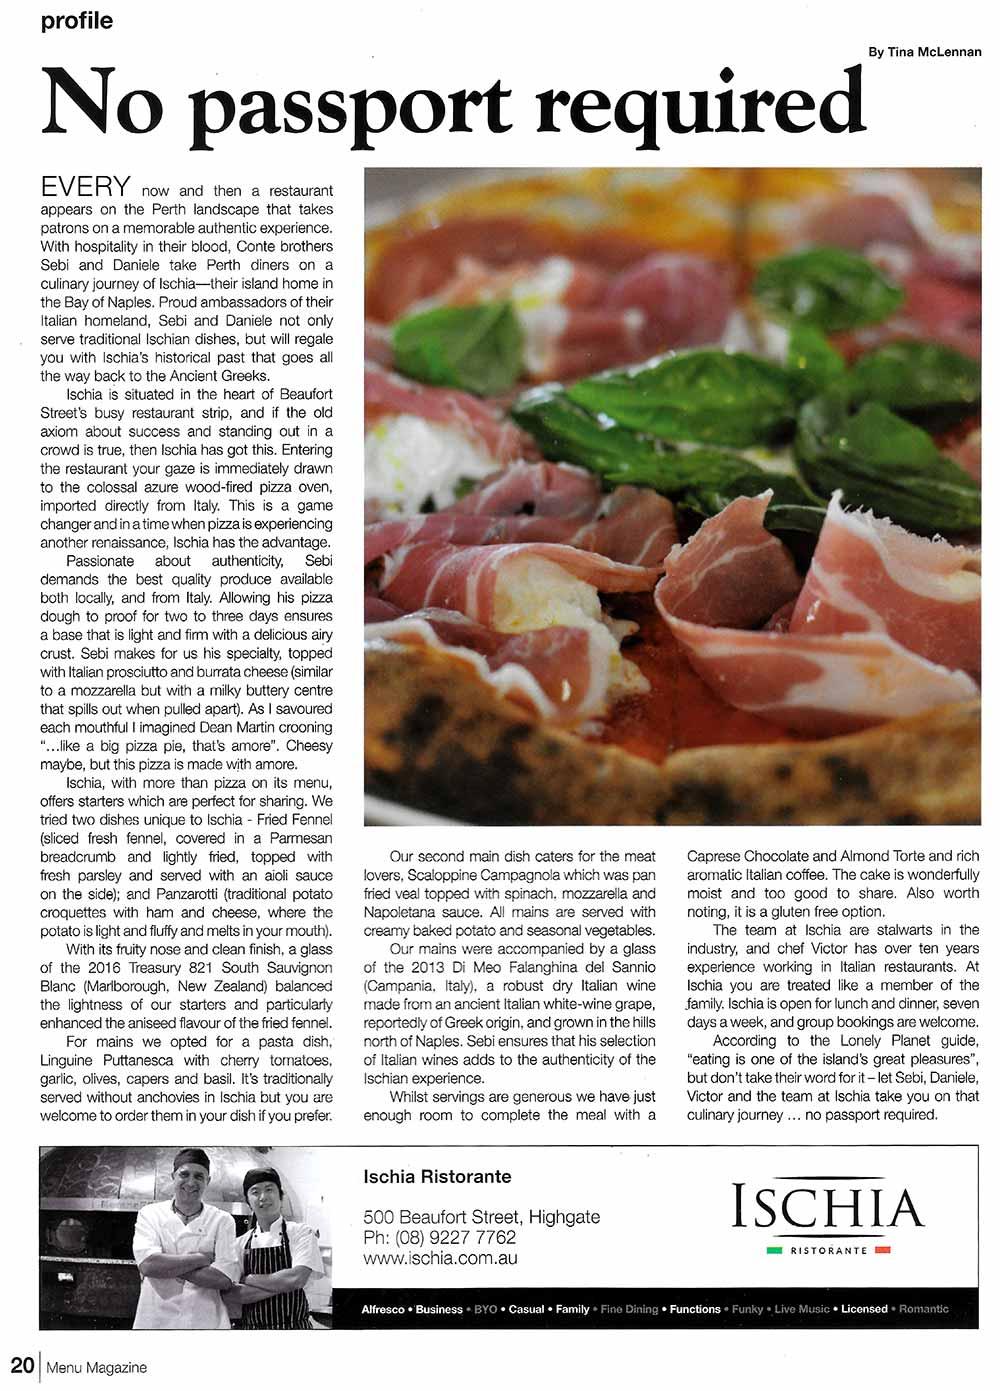 Coverage in Menu Magazine